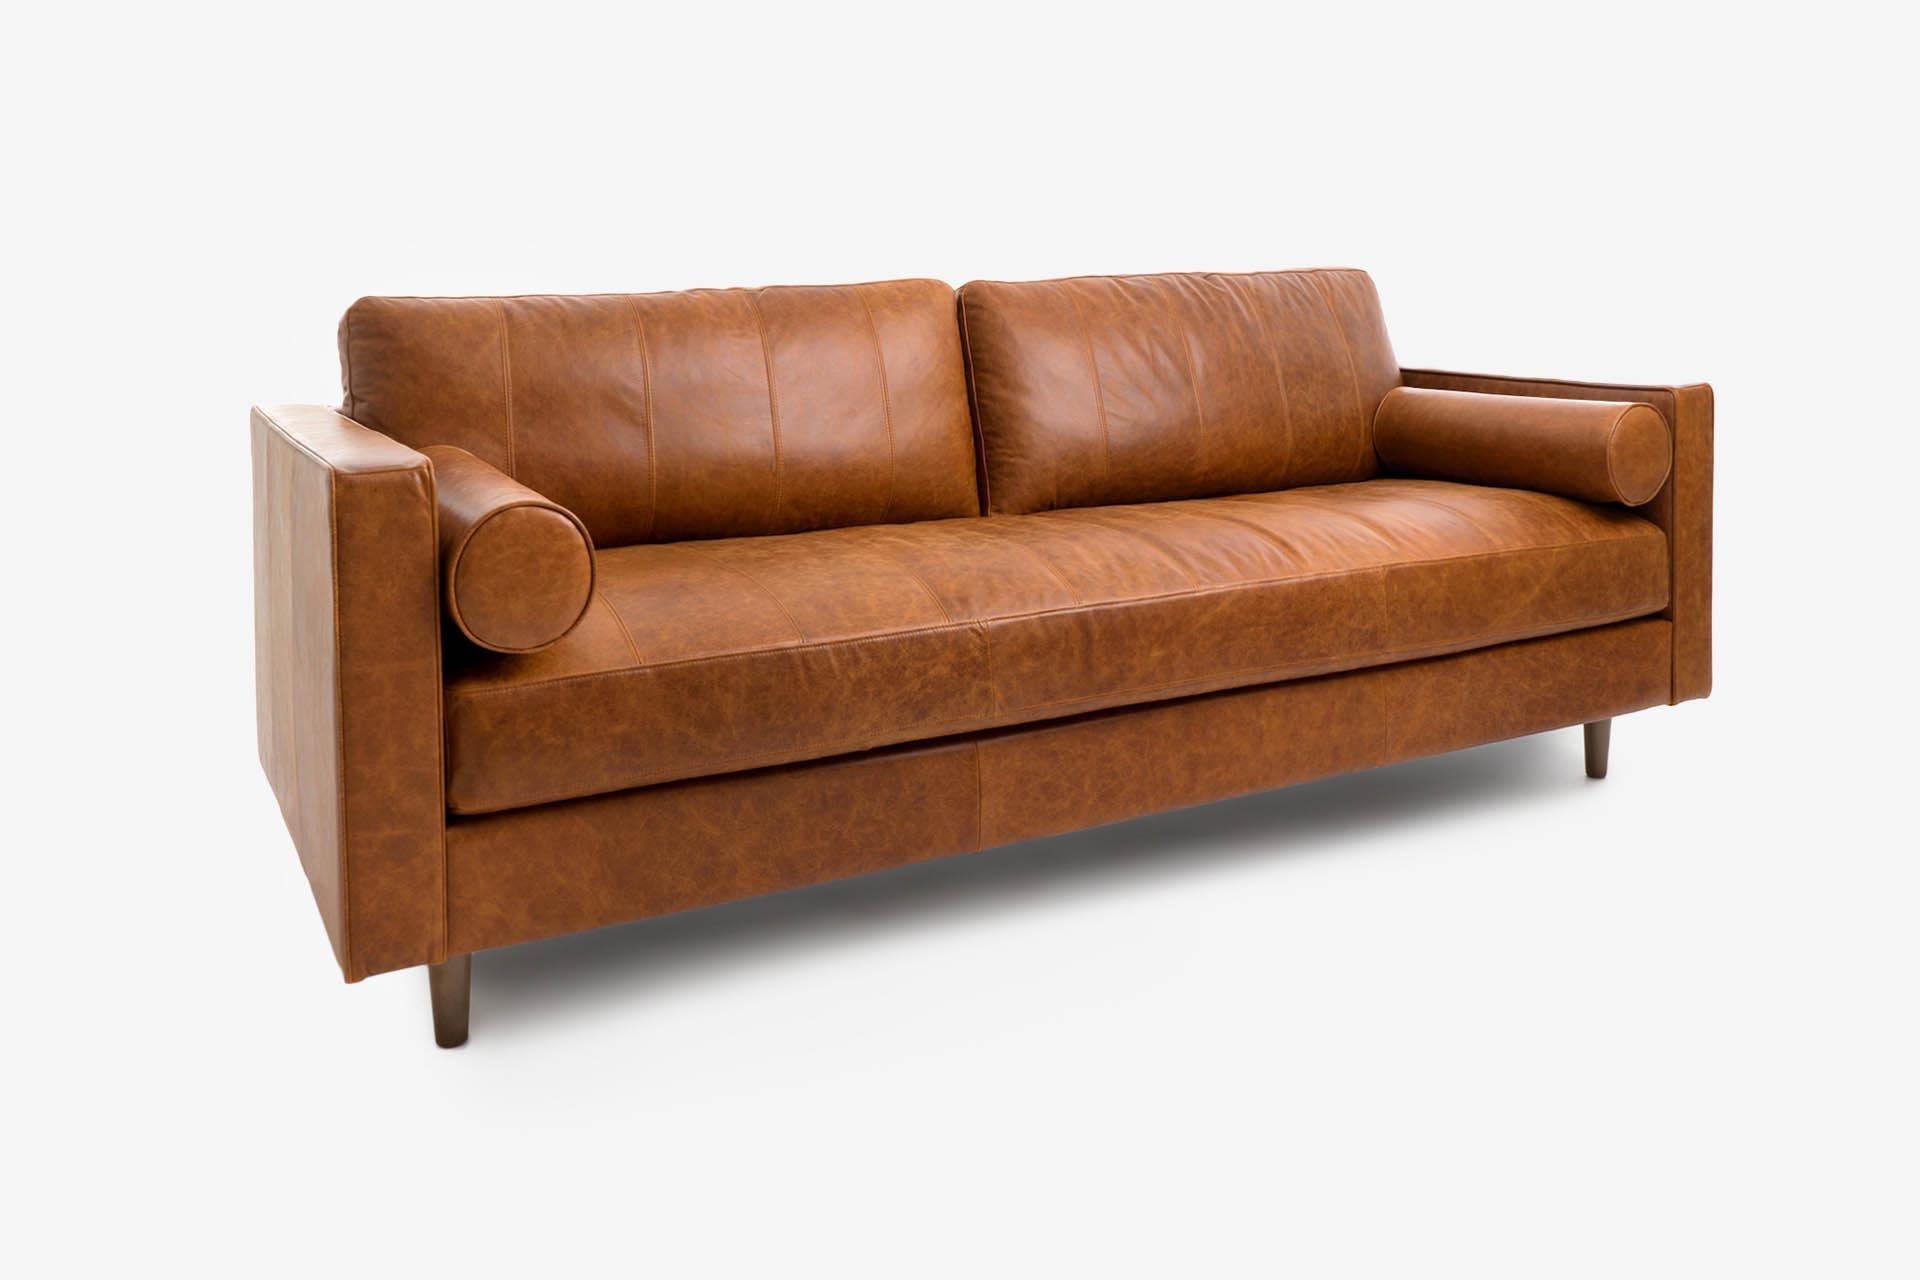 Full Size of Cognac Leather 3 Seater Sofa Walnut Nocciolo Ewald Schillig Kolonialstil Chesterfield Grau Big Tom Tailor Vitra Kaufen Günstig Kleines 2er Flexform Mit Sofa Sofa Cognac